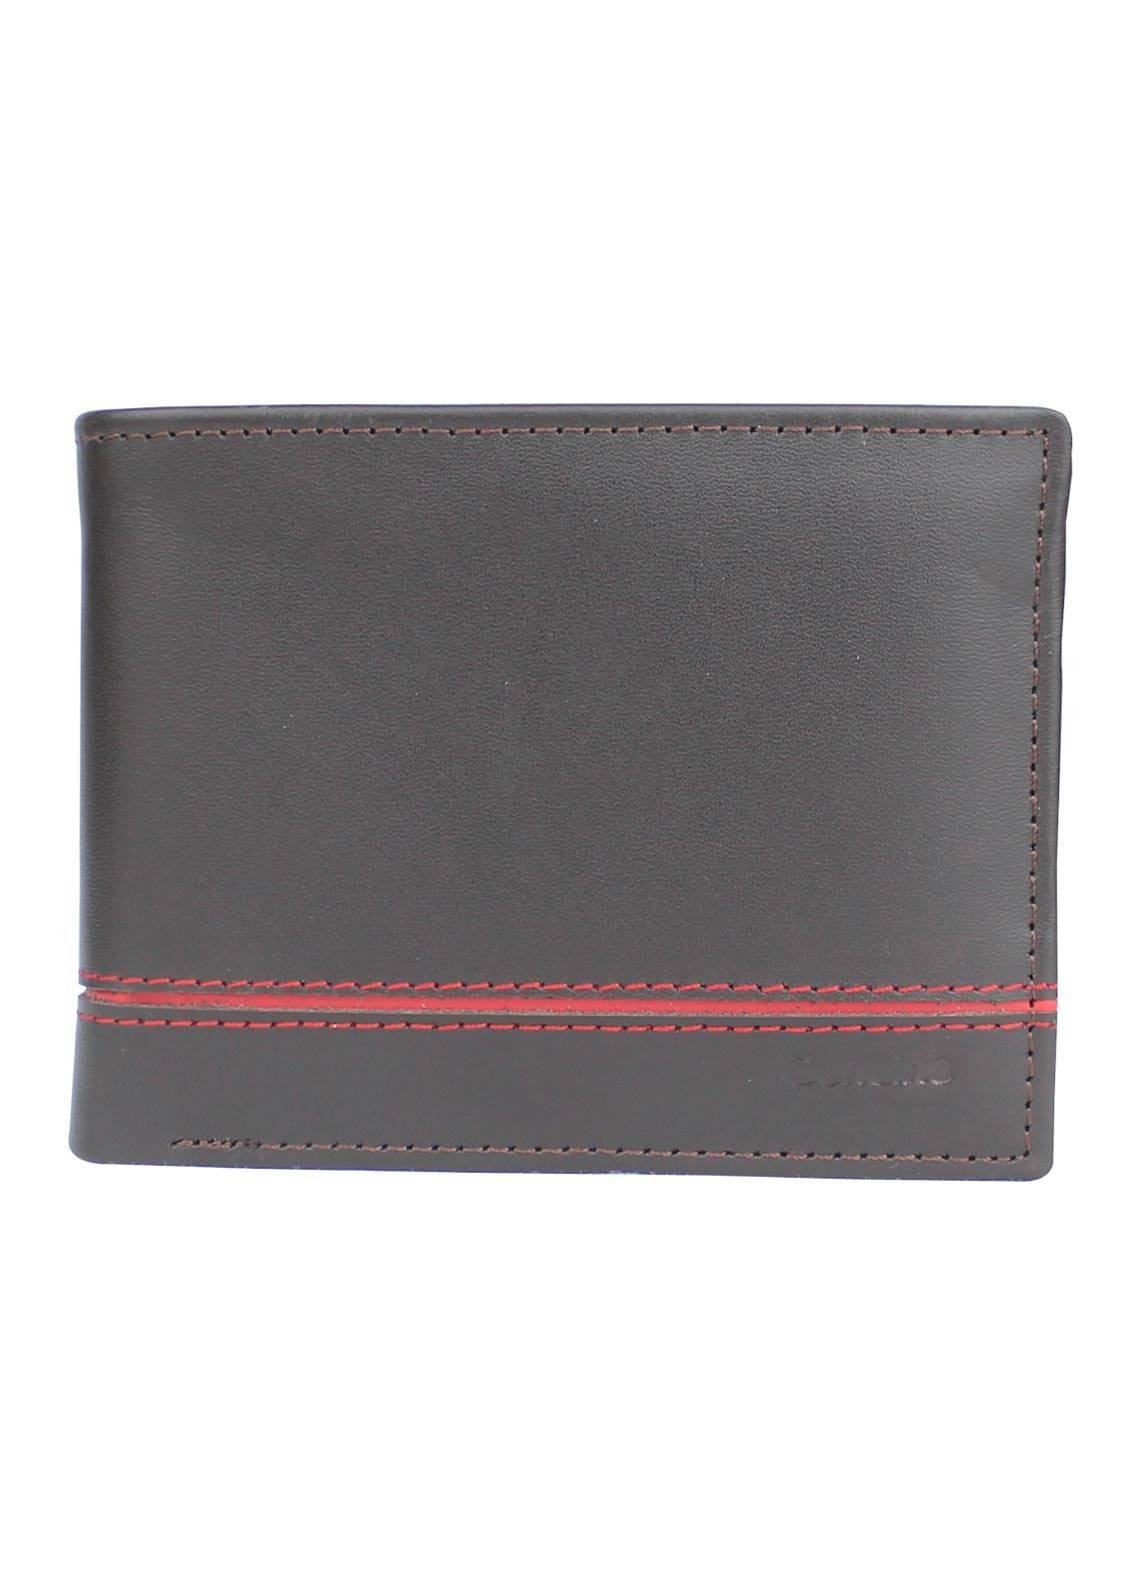 Shahzeb Saeed Plain Texture Leather Wallet W-065 - Men's Accessories